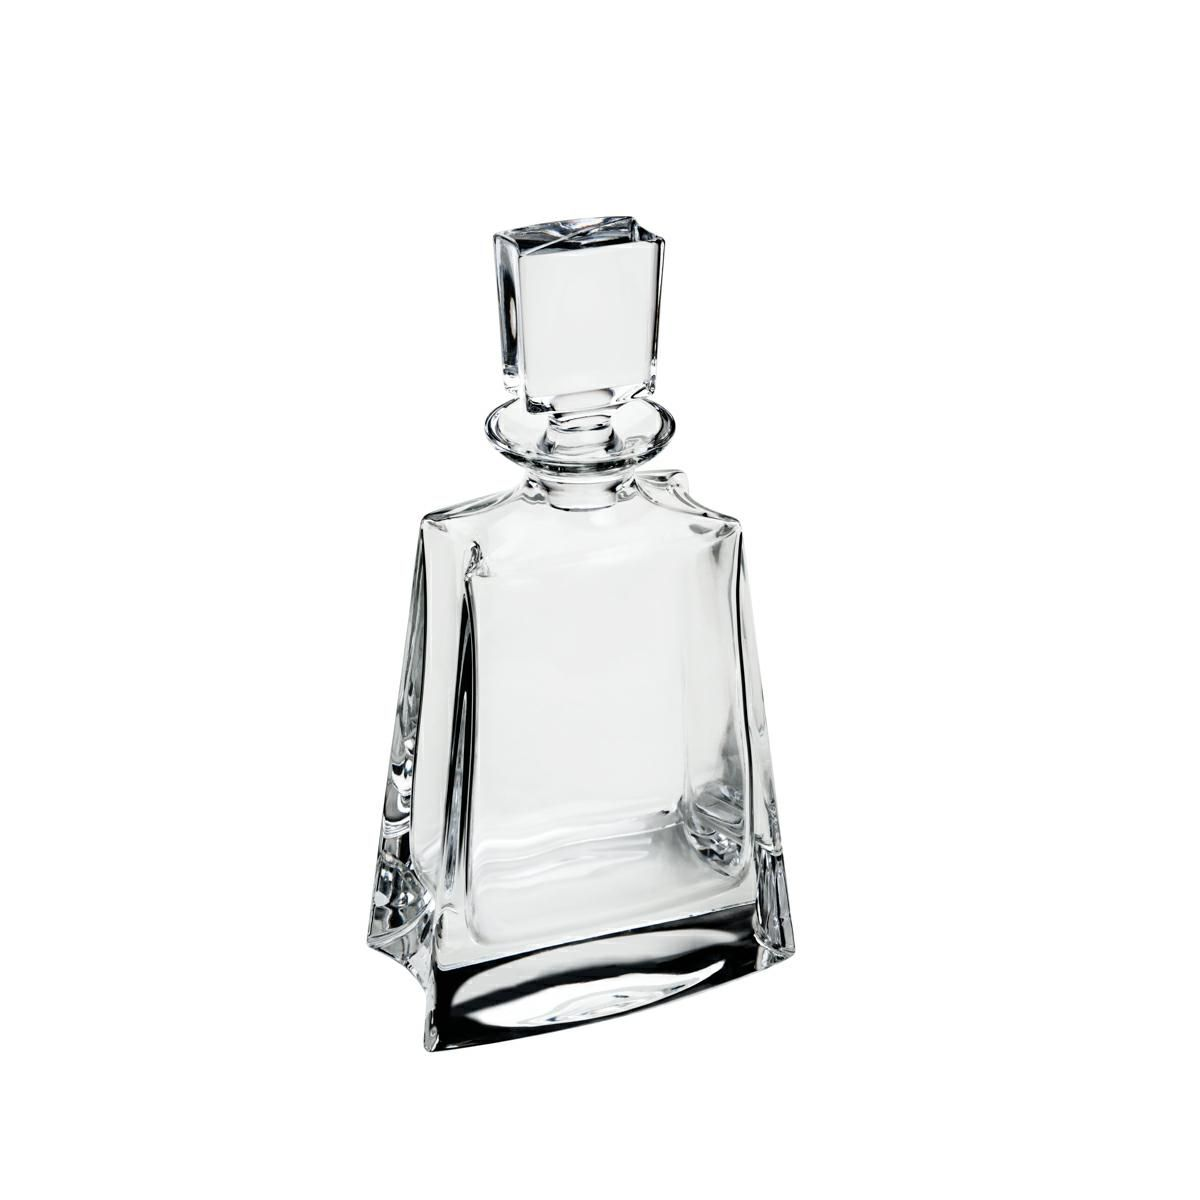 Garrafa 700ml para whisky de cristal transparente Kathrene Baixa Bohemia - 35148